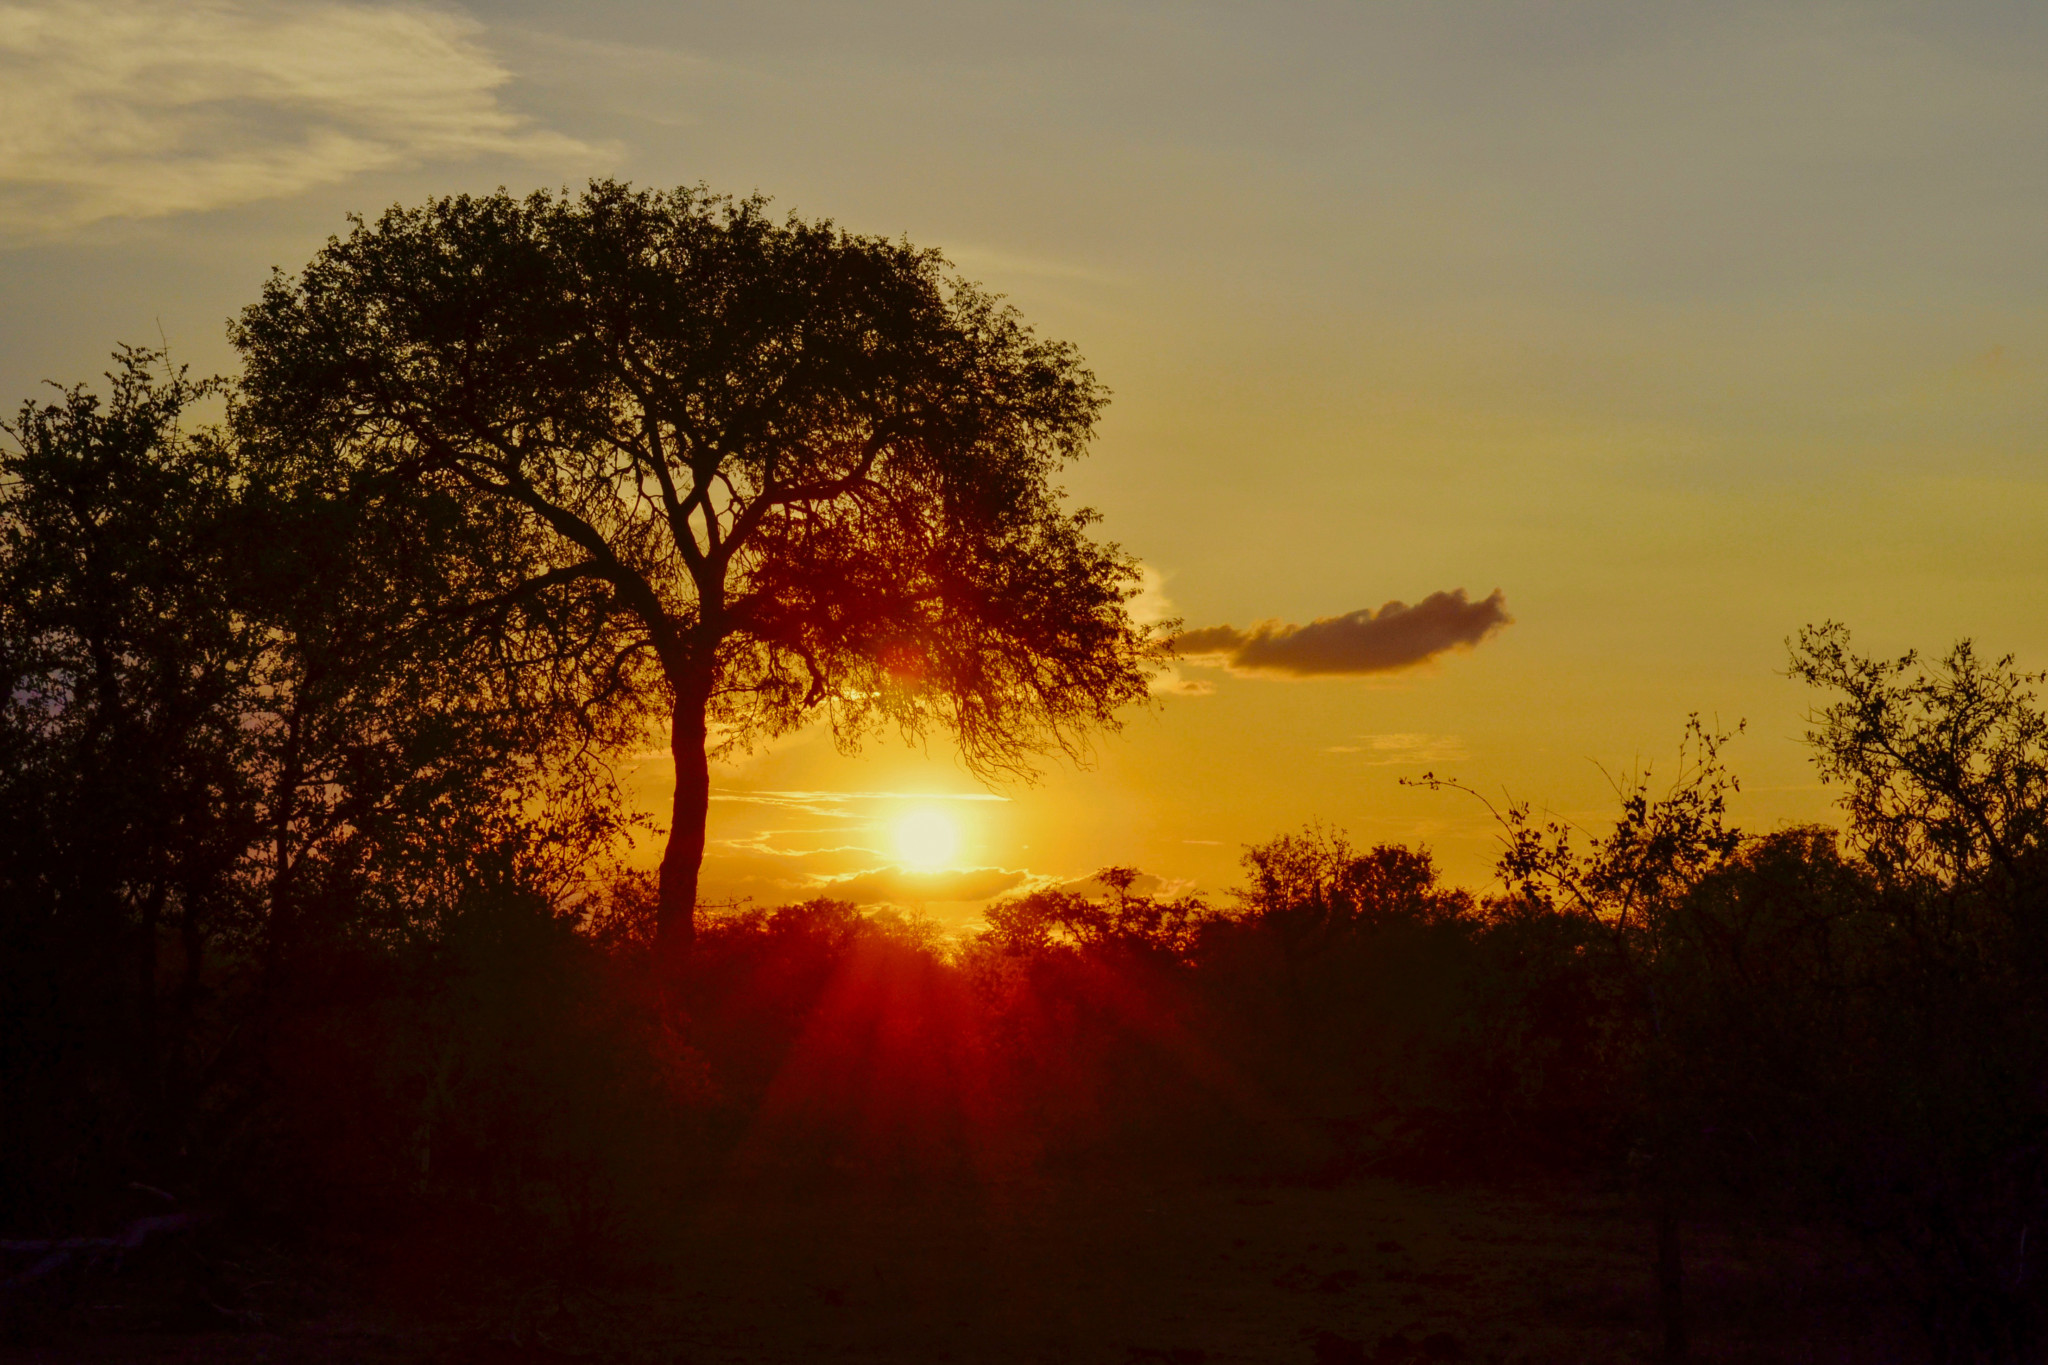 Sonnenuntergänge auf Safari sind unbezahlbar